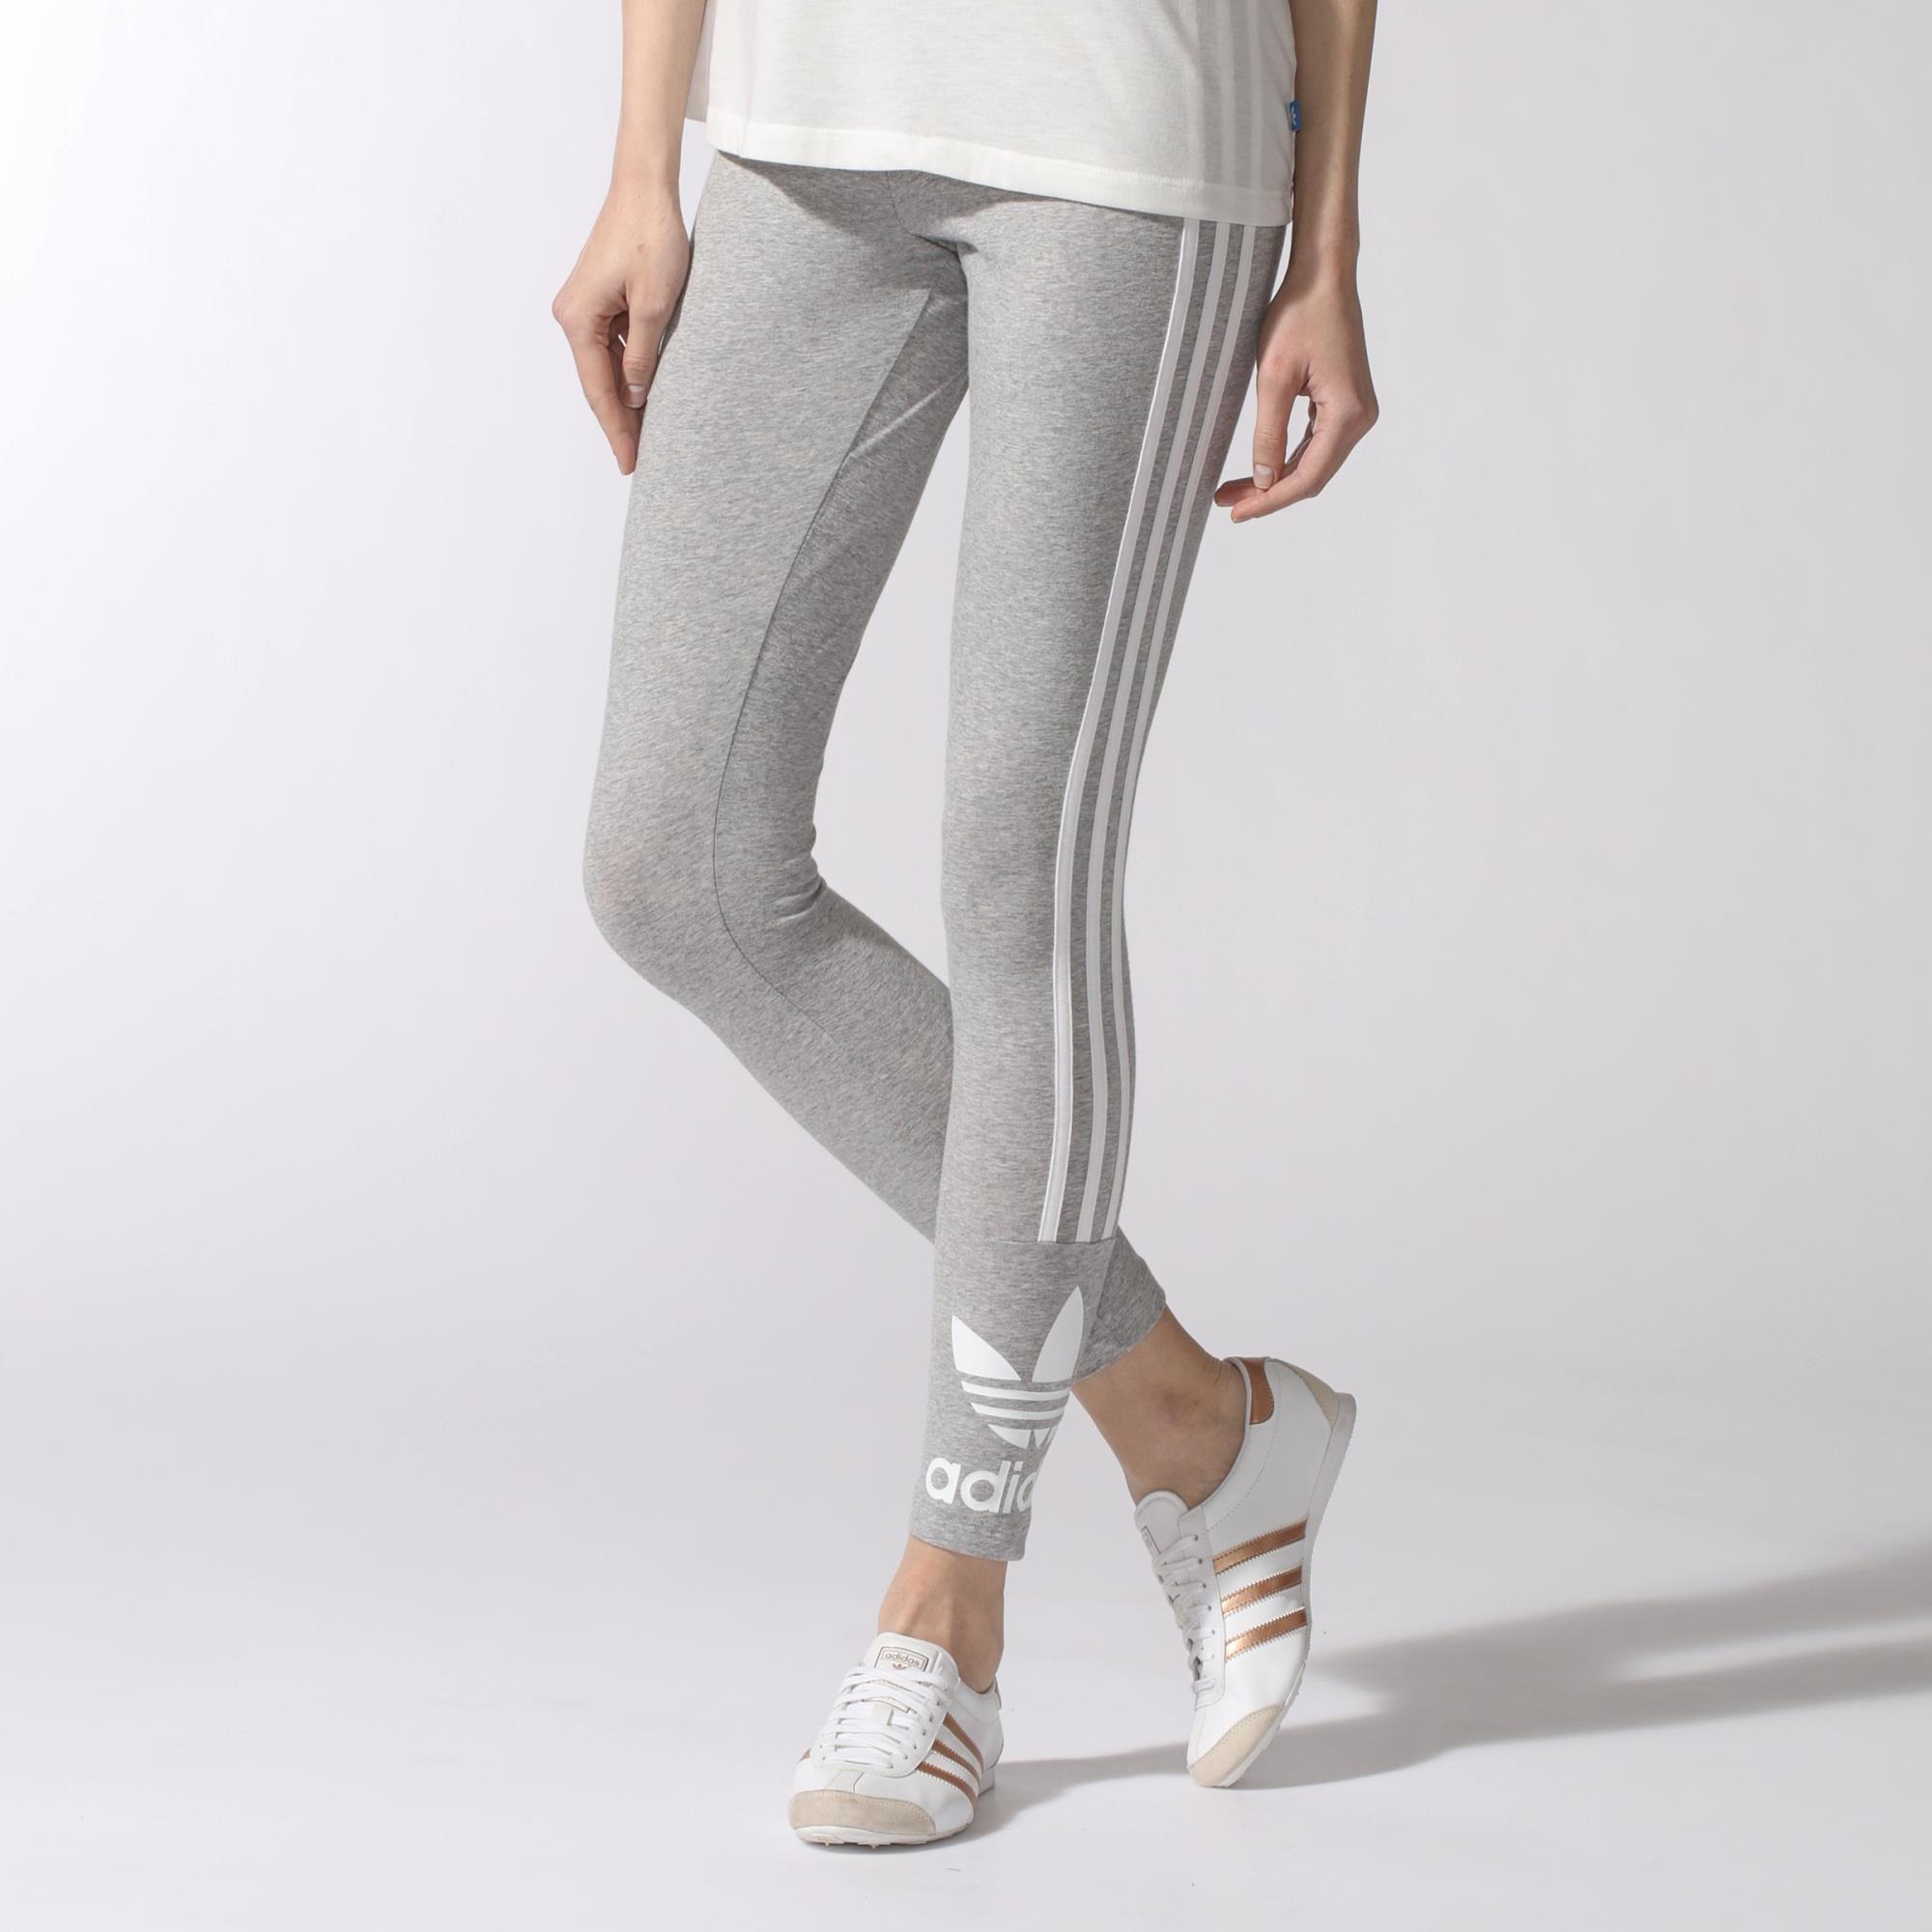 d055e0e3422 adidas Women's 3-Stripes Leggings - Grey   adidas Canada